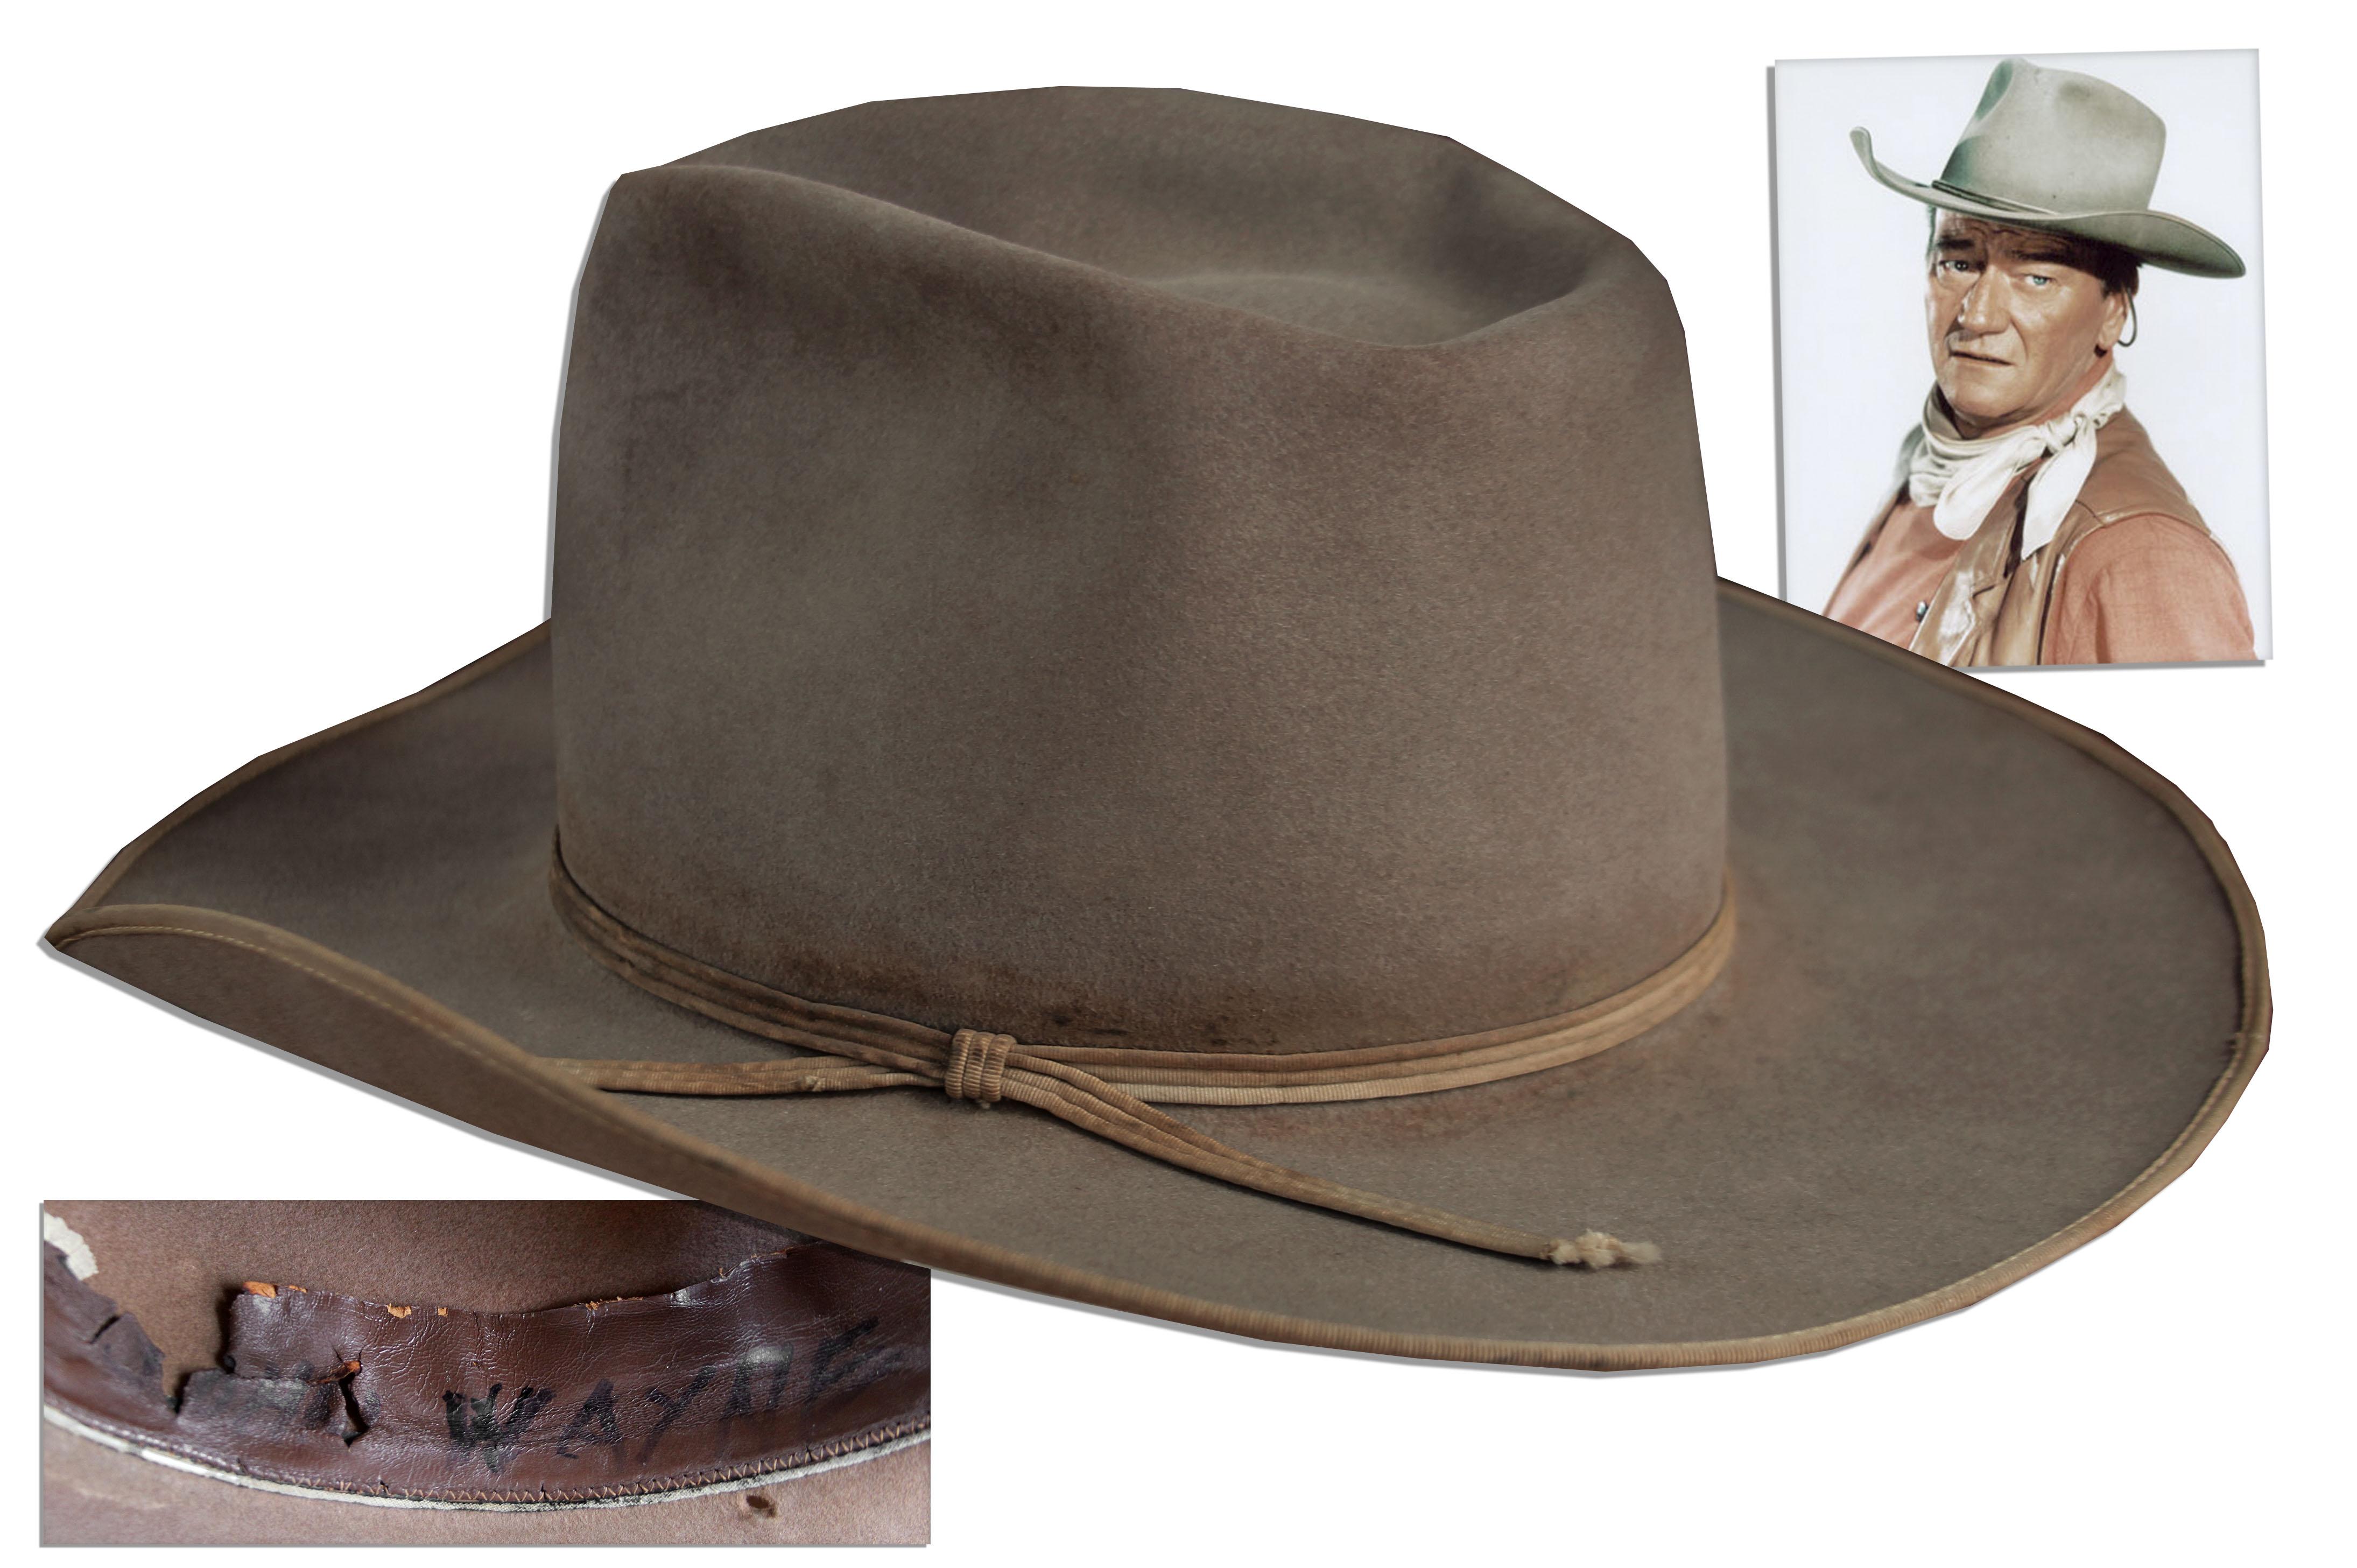 3b693497f73 John Wayne Worn Costume Auction. Scarce John Wayne Cowboy Hat ...